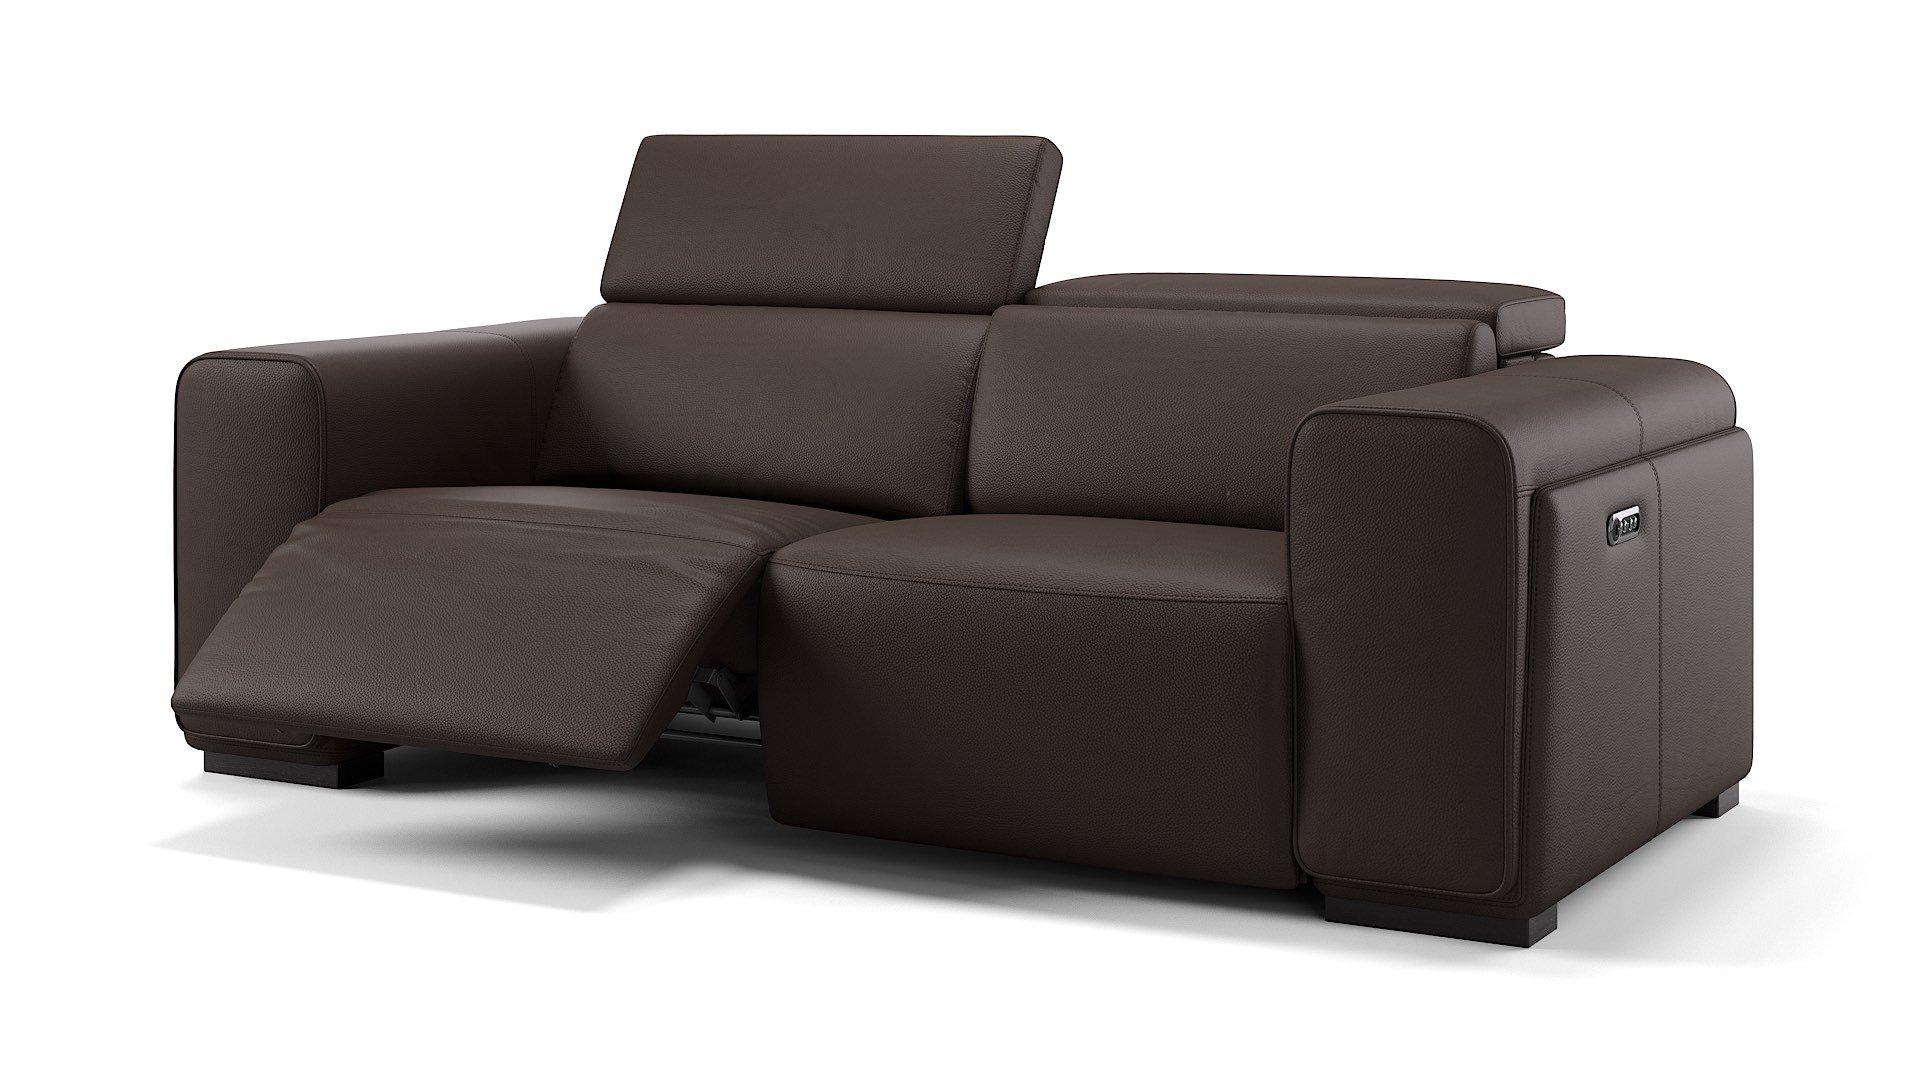 Leder 3-Sitzer Sofa IMPERIA